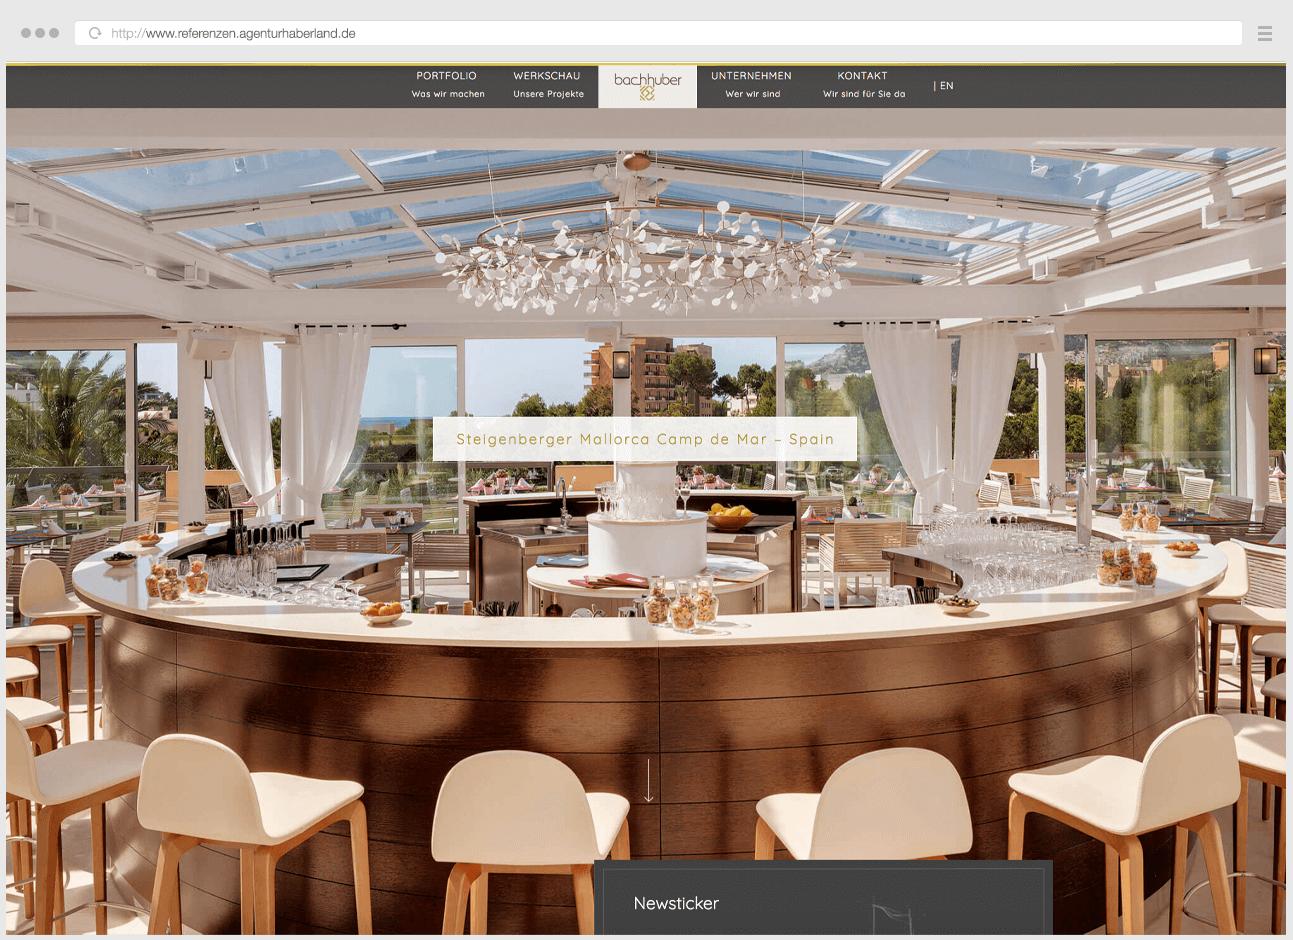 Webdesign Eggenfelden - Haberland - Portfolio Bachhuber - Startseitenslider - Steigenberger Mallorca